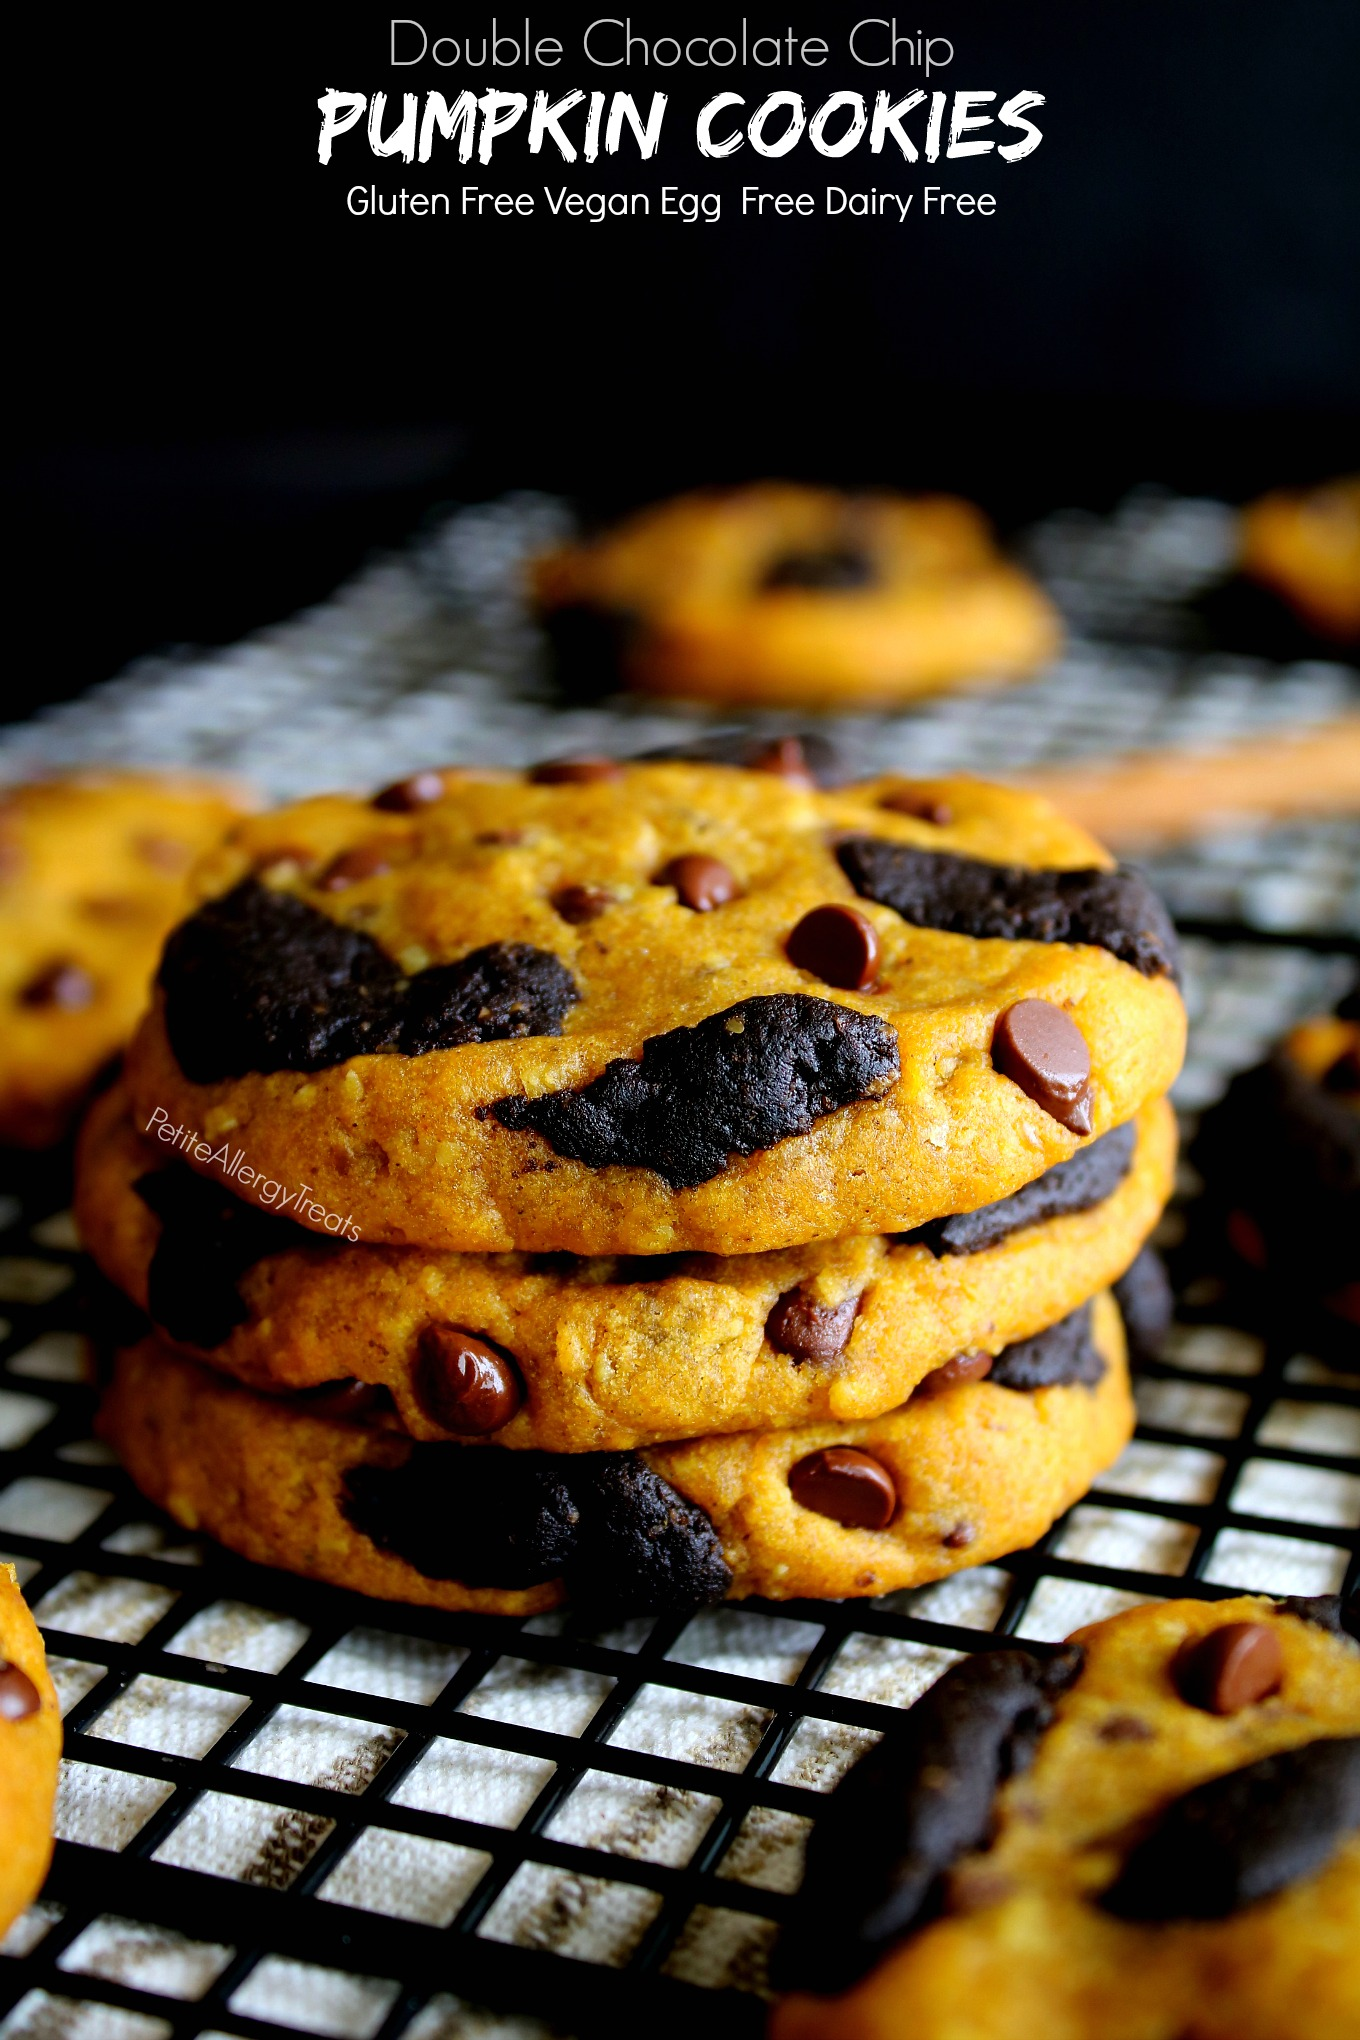 Gluten Free Double Chocolate Chip Pumpkin Cookies Recipe (vegan dairy free) Pumpkin filled chocolate cookies with warm pumpkin spice. Food Allergy friendly.